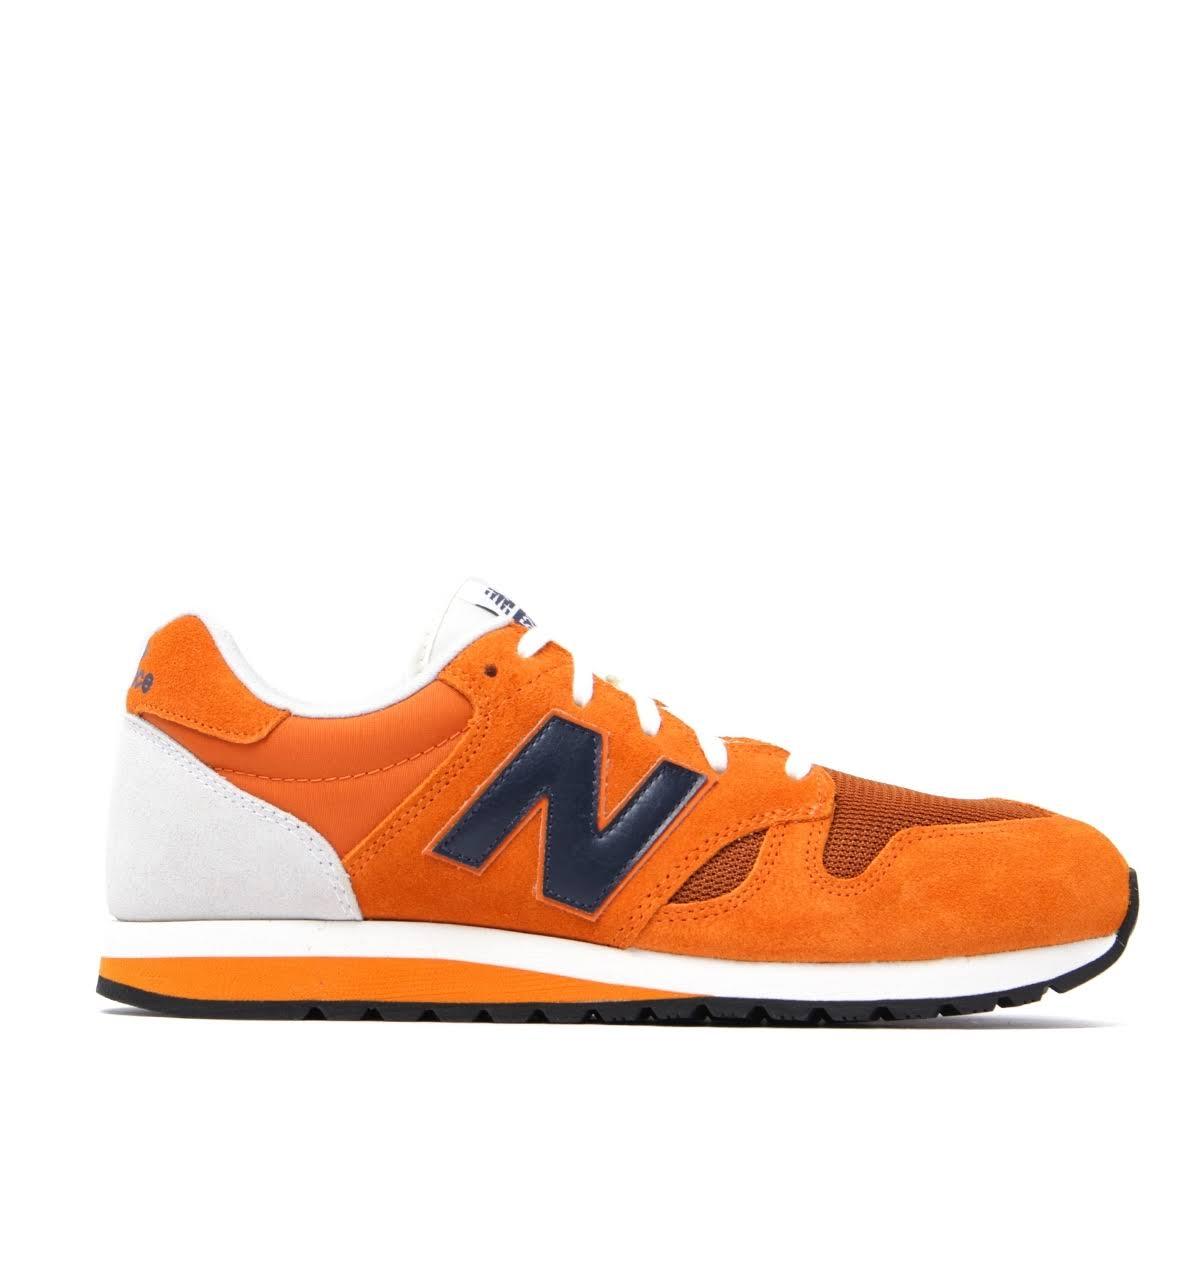 Balance 520 New Trainers Orange Suede gqqdSBCw